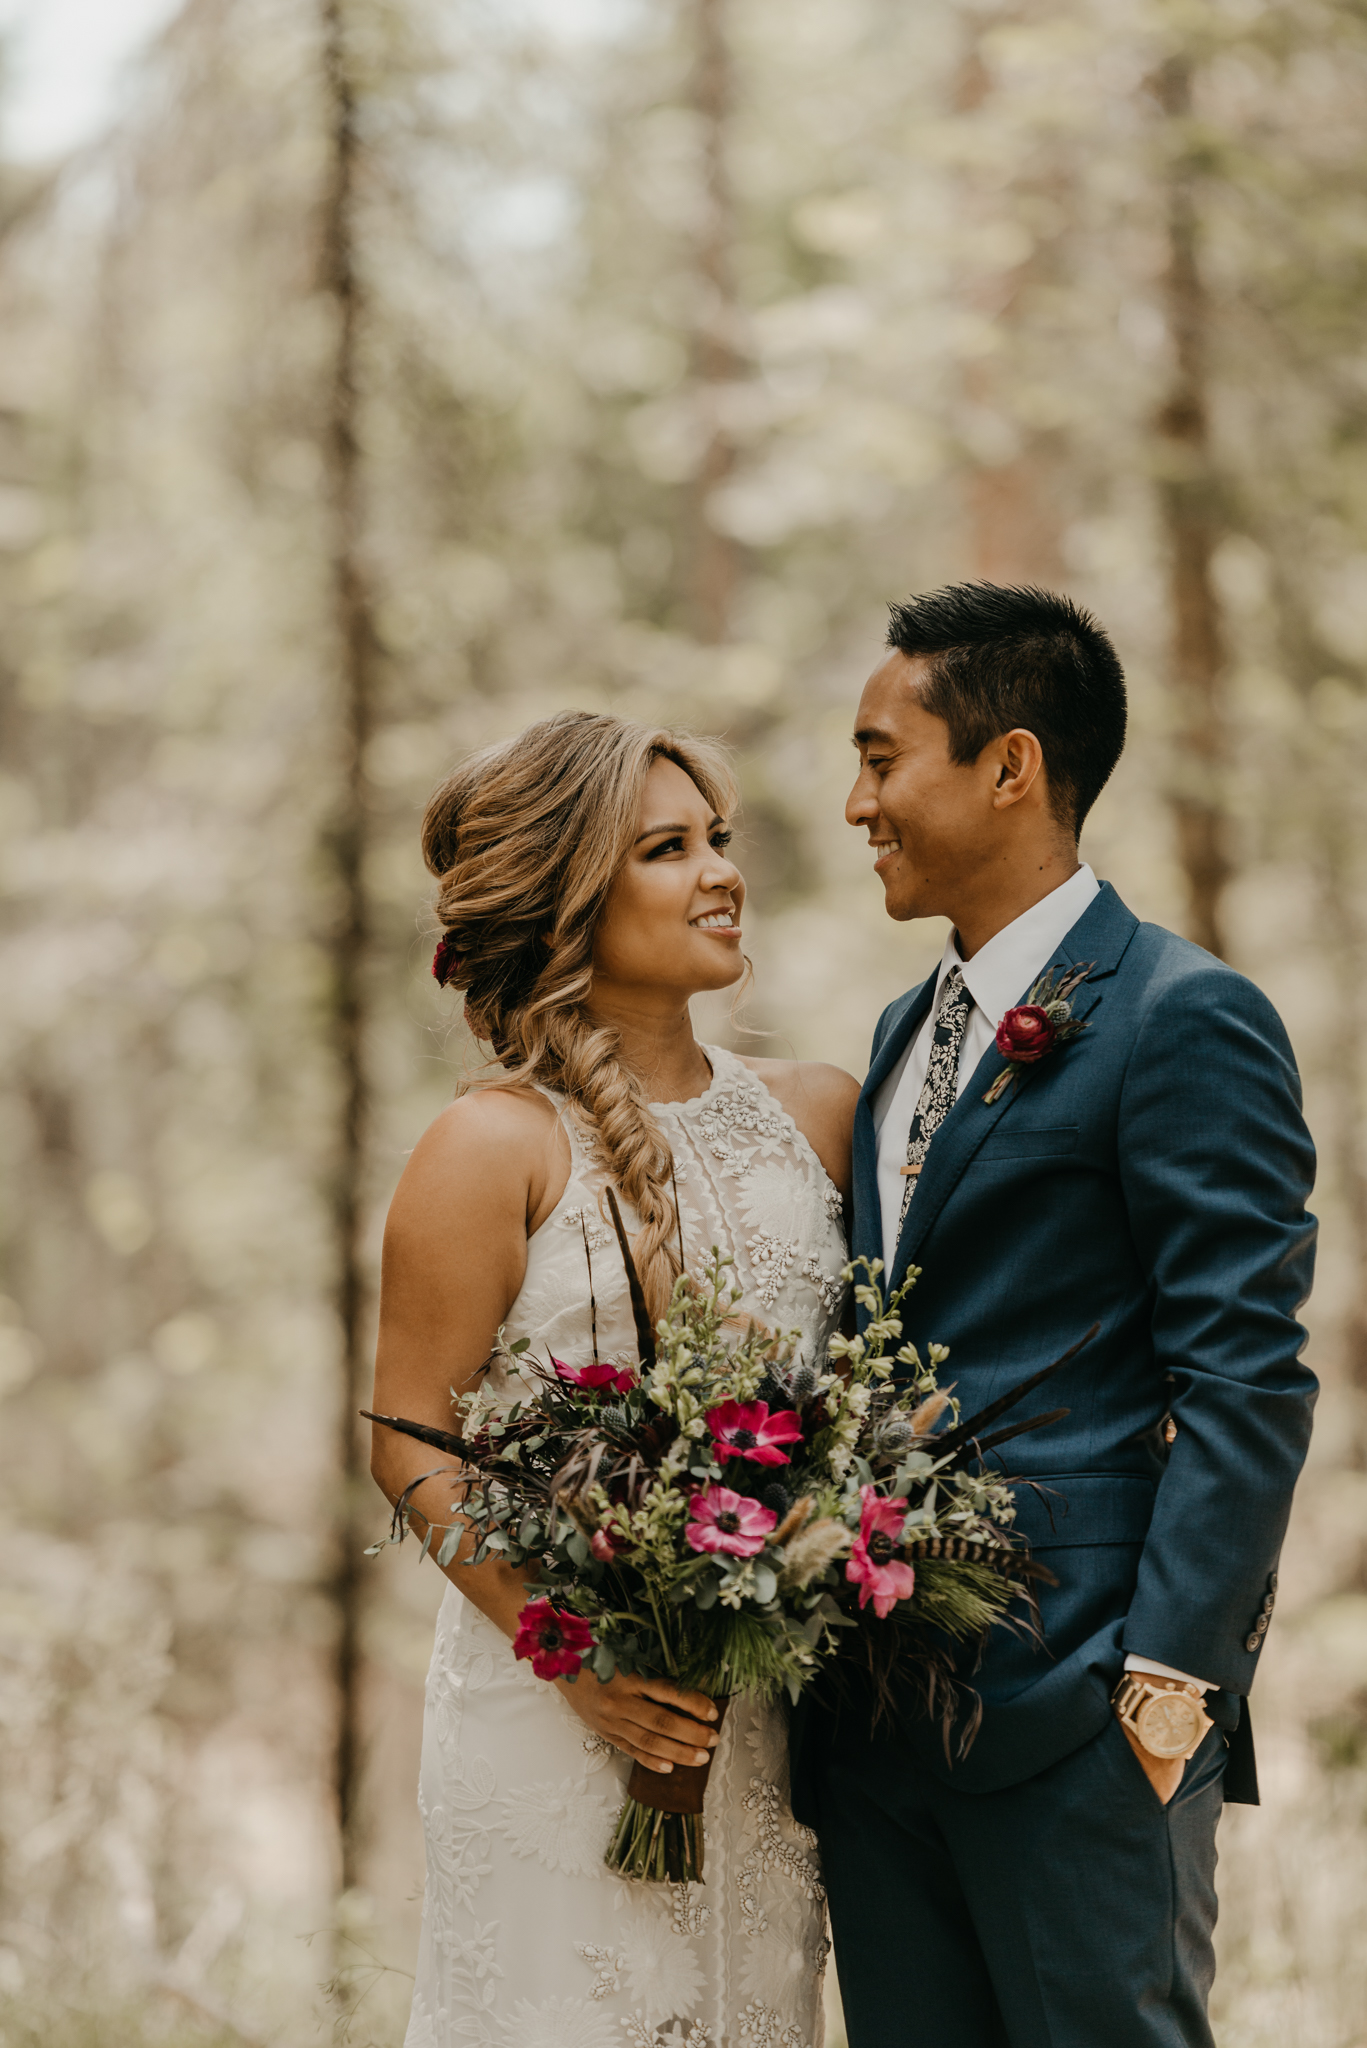 © Isaiah + Taylor Photography - Evergreen Lodge Destination Yoesmite Wedding - Los Angeles Wedding Photographer-077.jpg